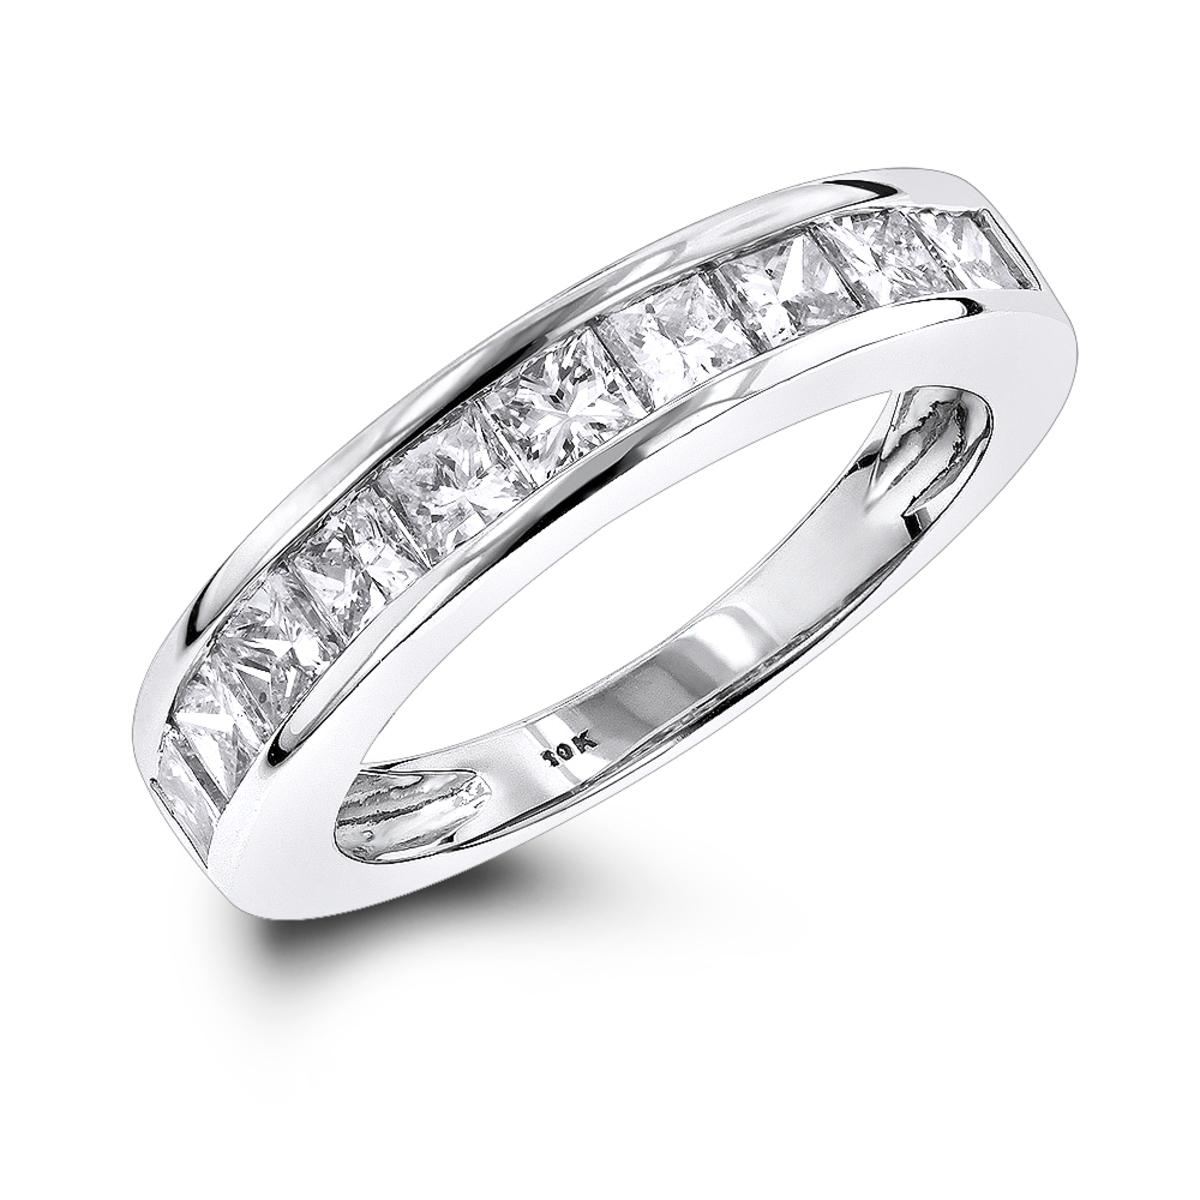 Thin 1 Row Princess Cut Diamond Wedding Band 1.65ct 10K Gold